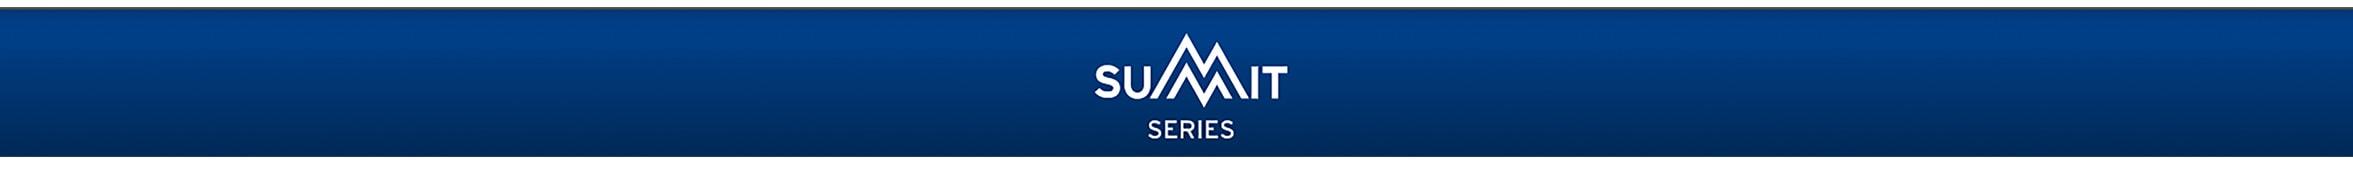 Kimber Kable Summit serie